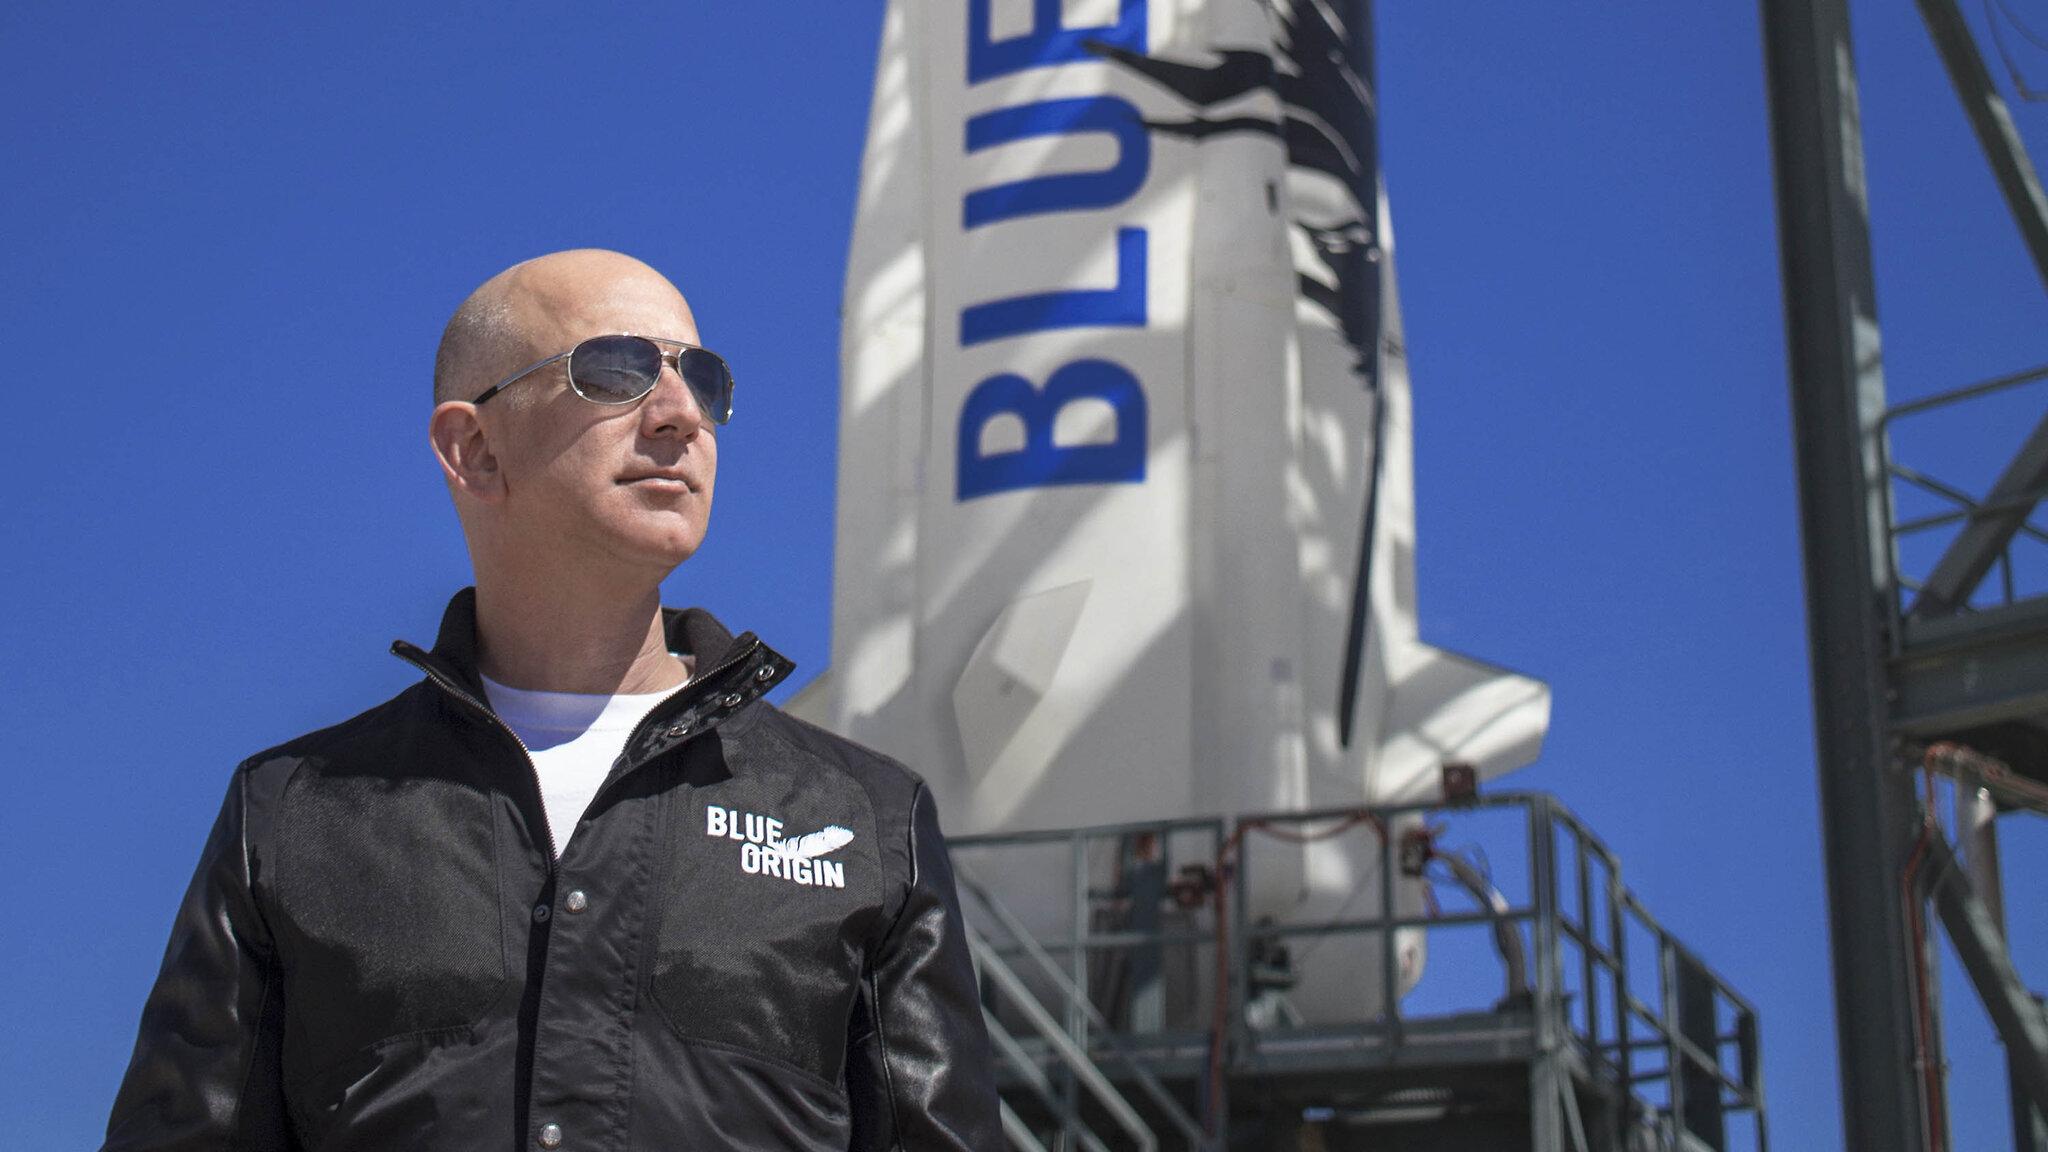 Jeff Bezos offers $2 billion discount to NASA for Moon Lander